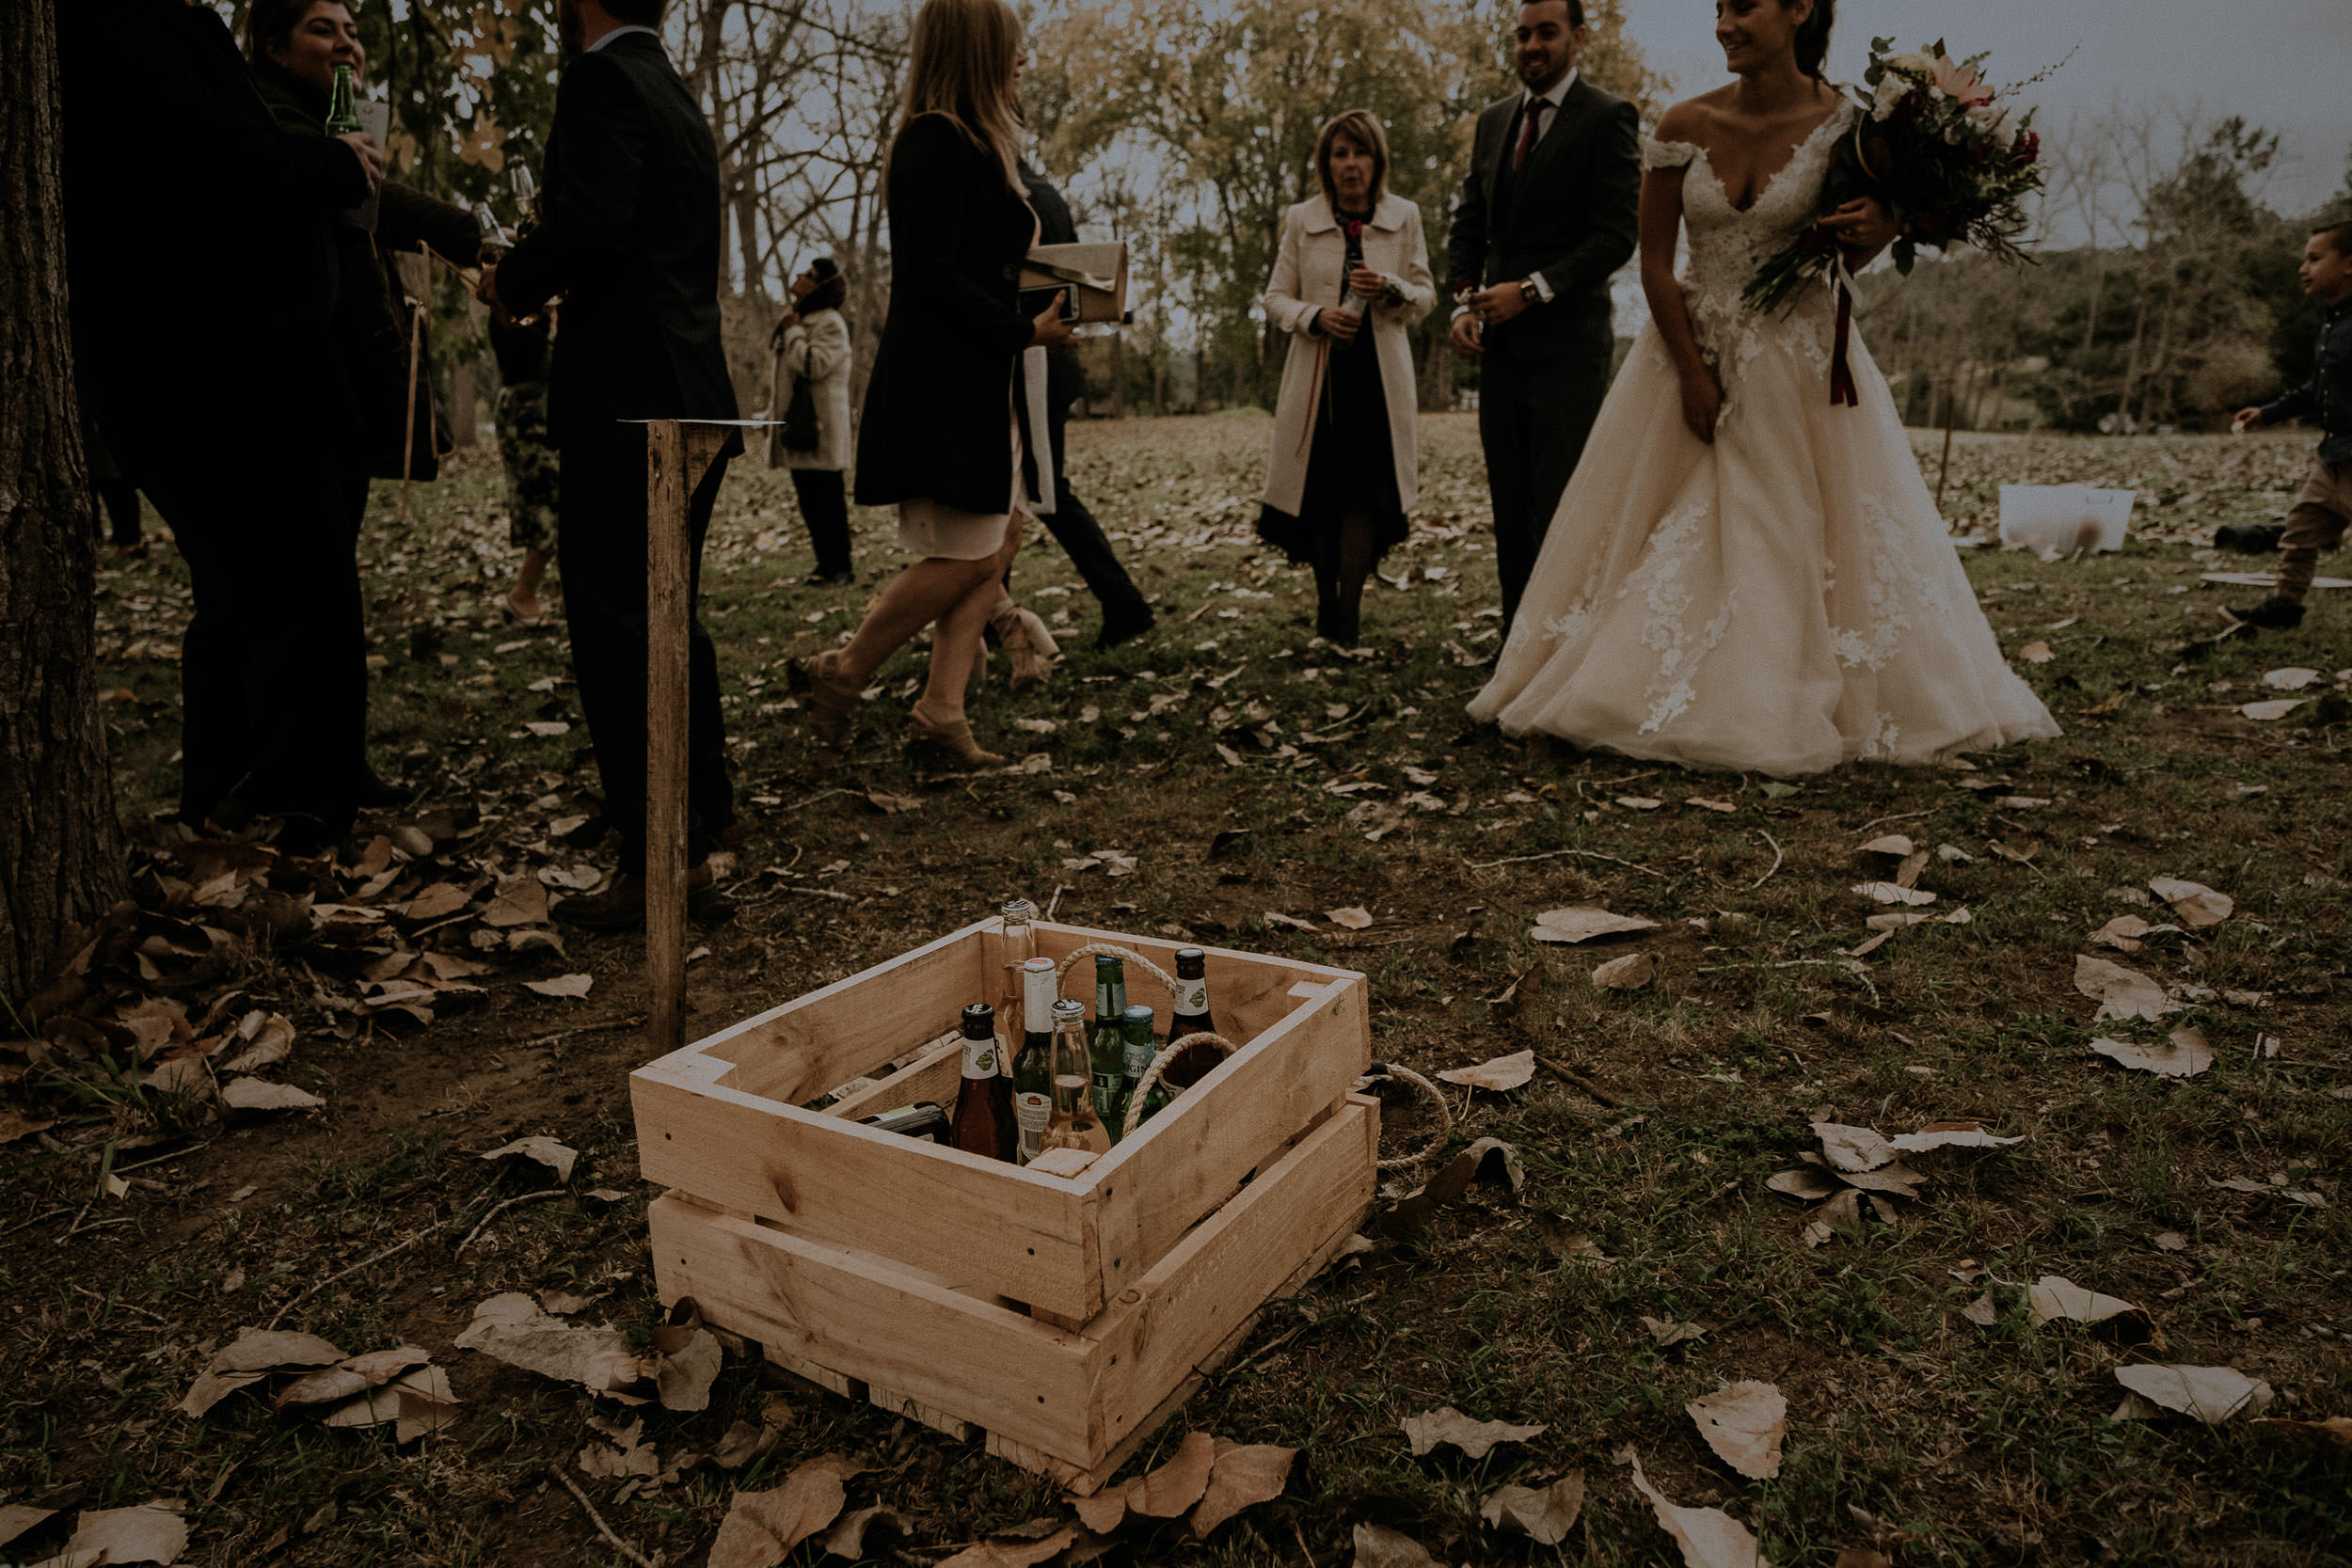 g_c wedding - kings _ thieves elopement wedding photography - blog 64.jpg